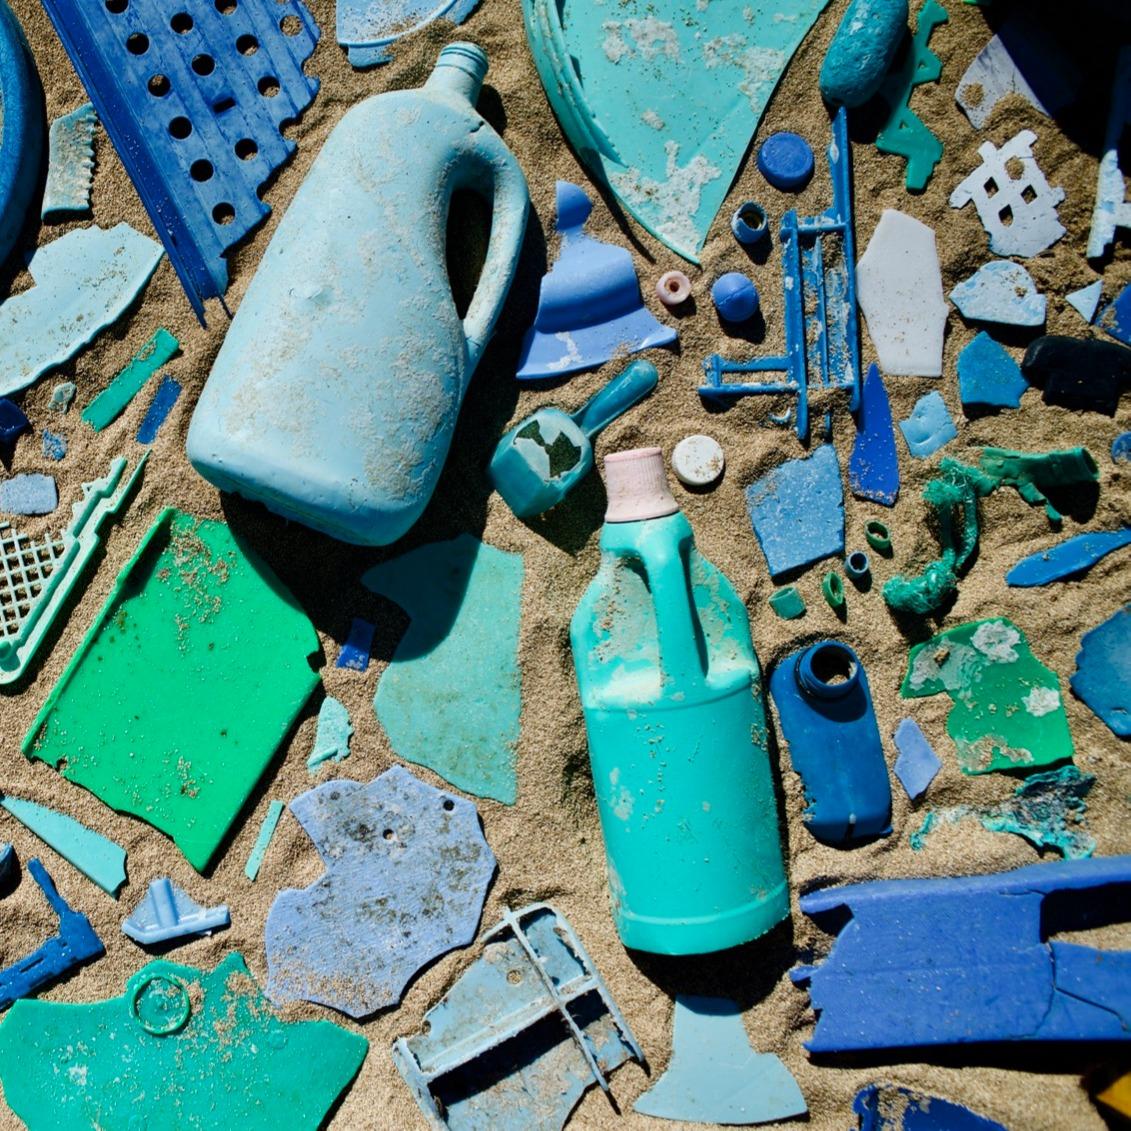 2019 Beach Cleanup Report